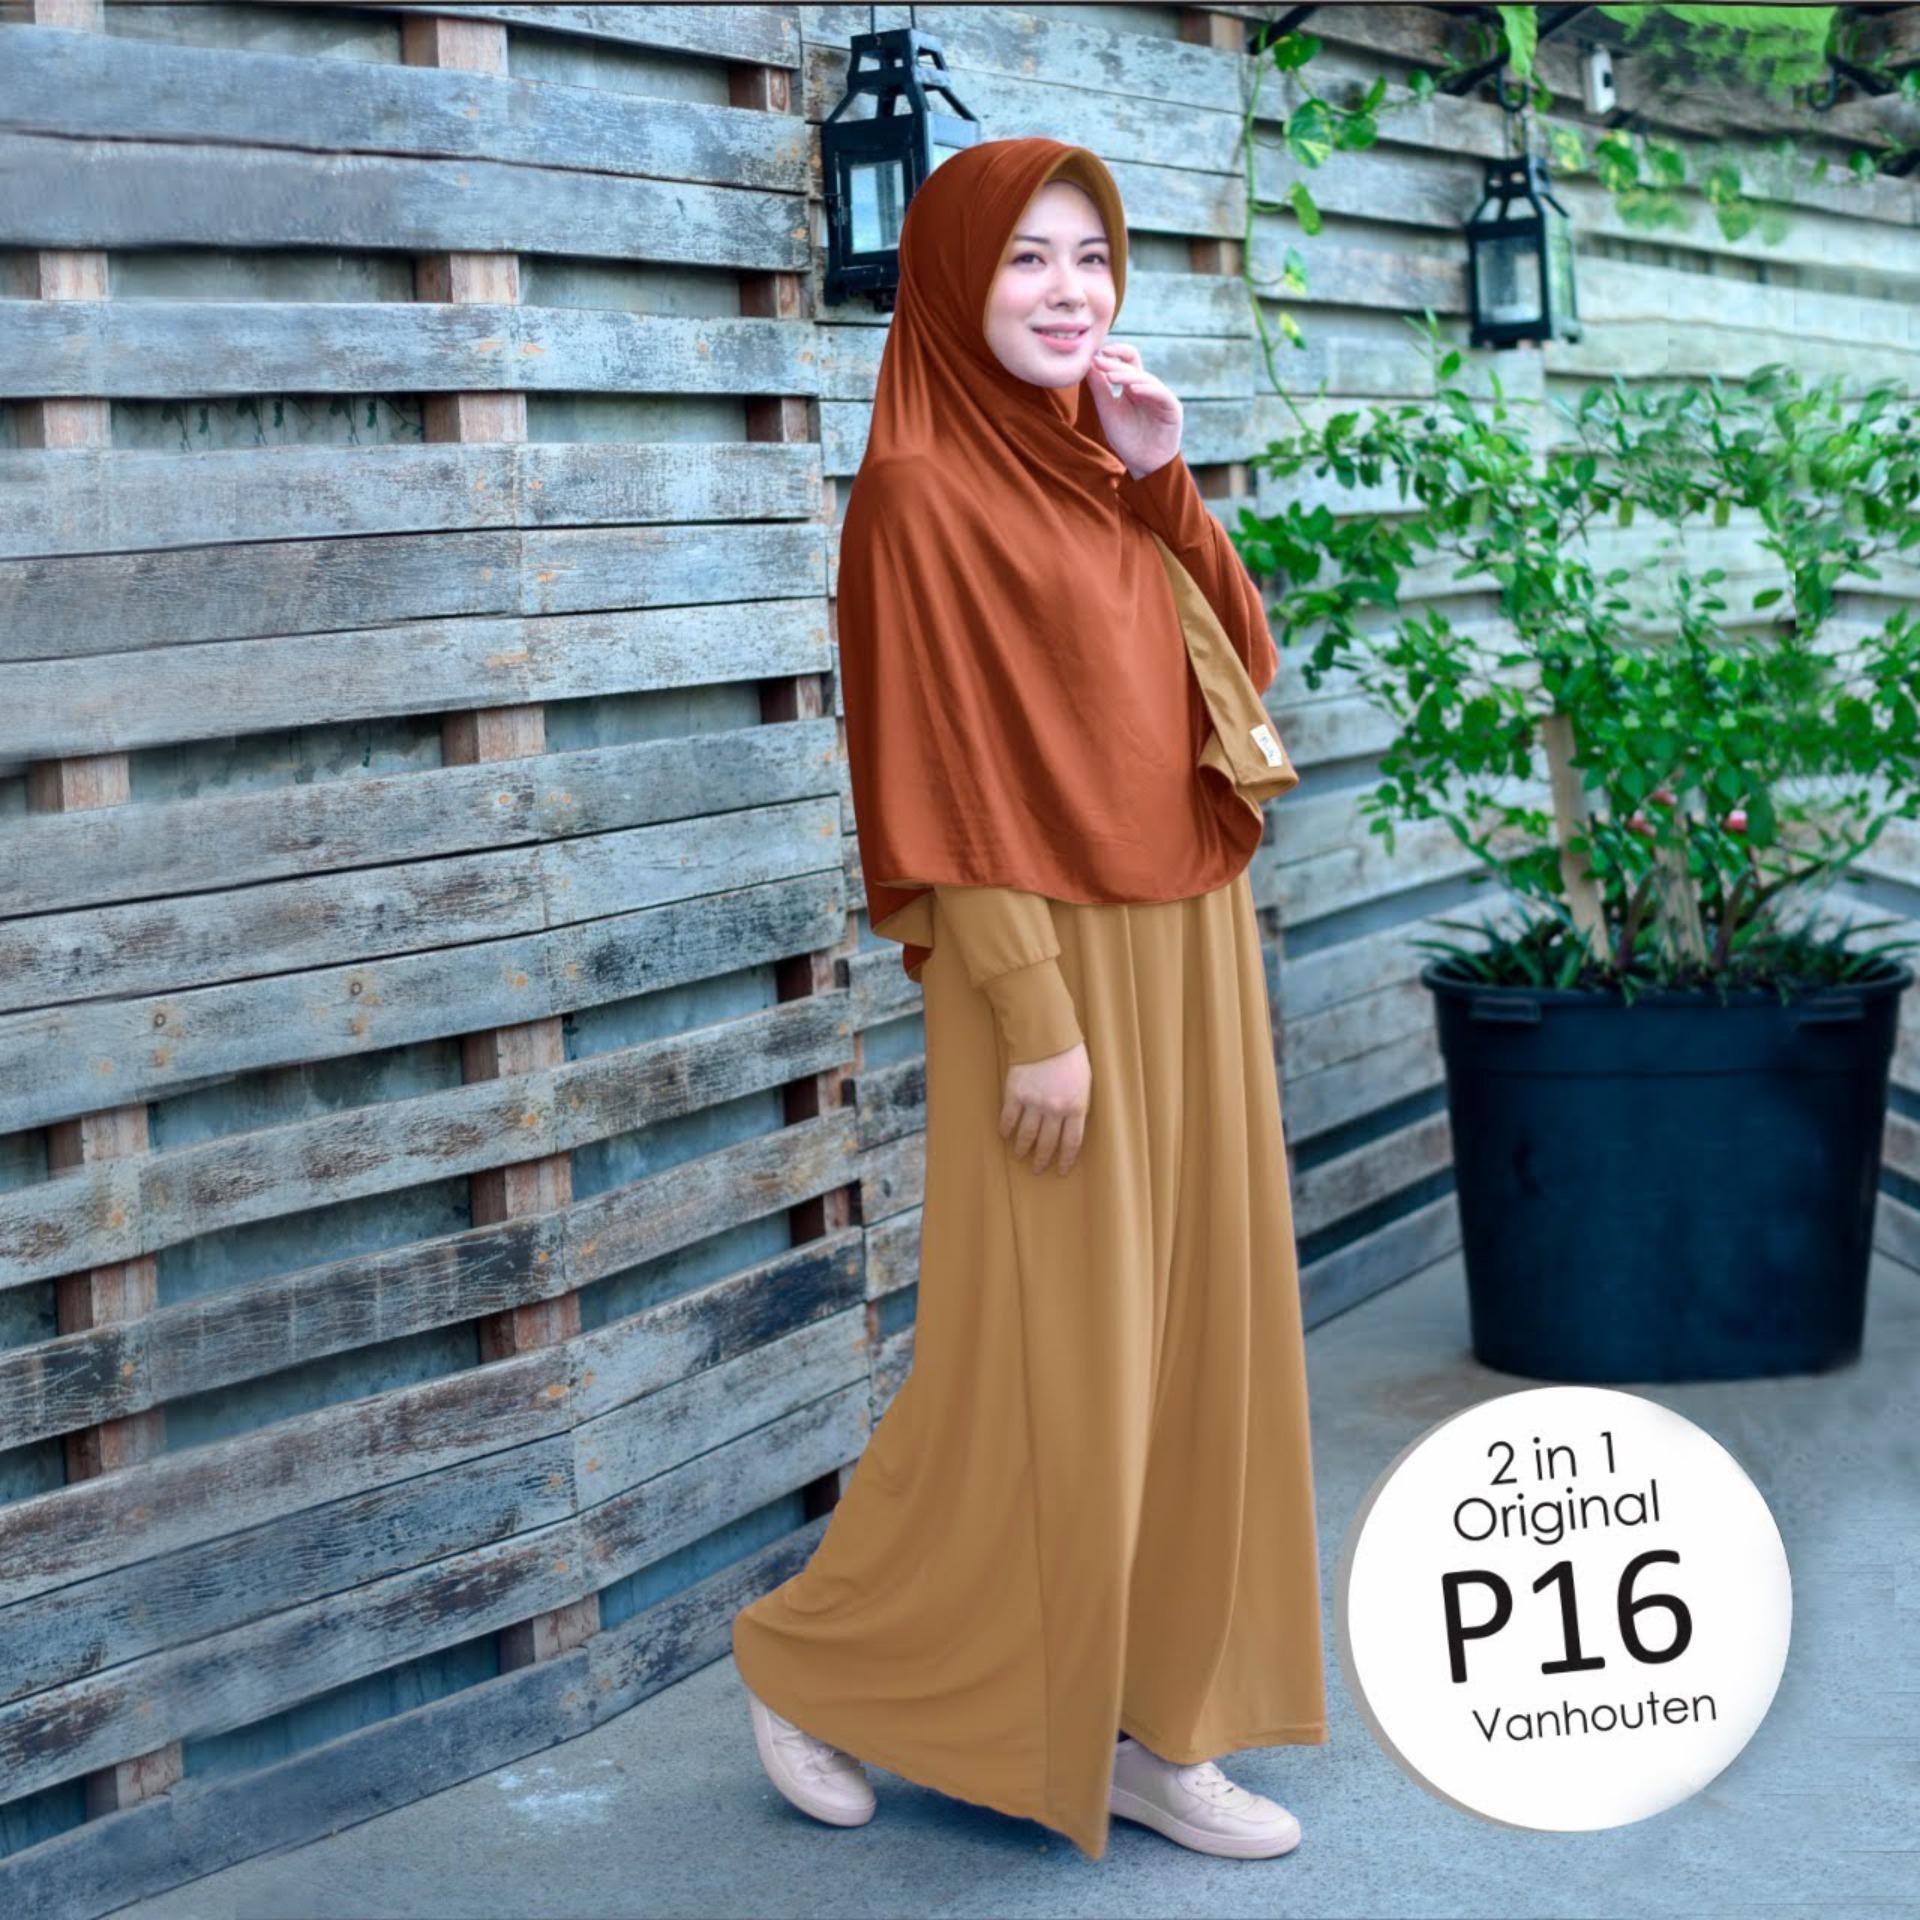 Jilbab 2 Warna / Jilbab Instan Bolak Balik / Hijab Instant / Kerudung Syari / Bergo